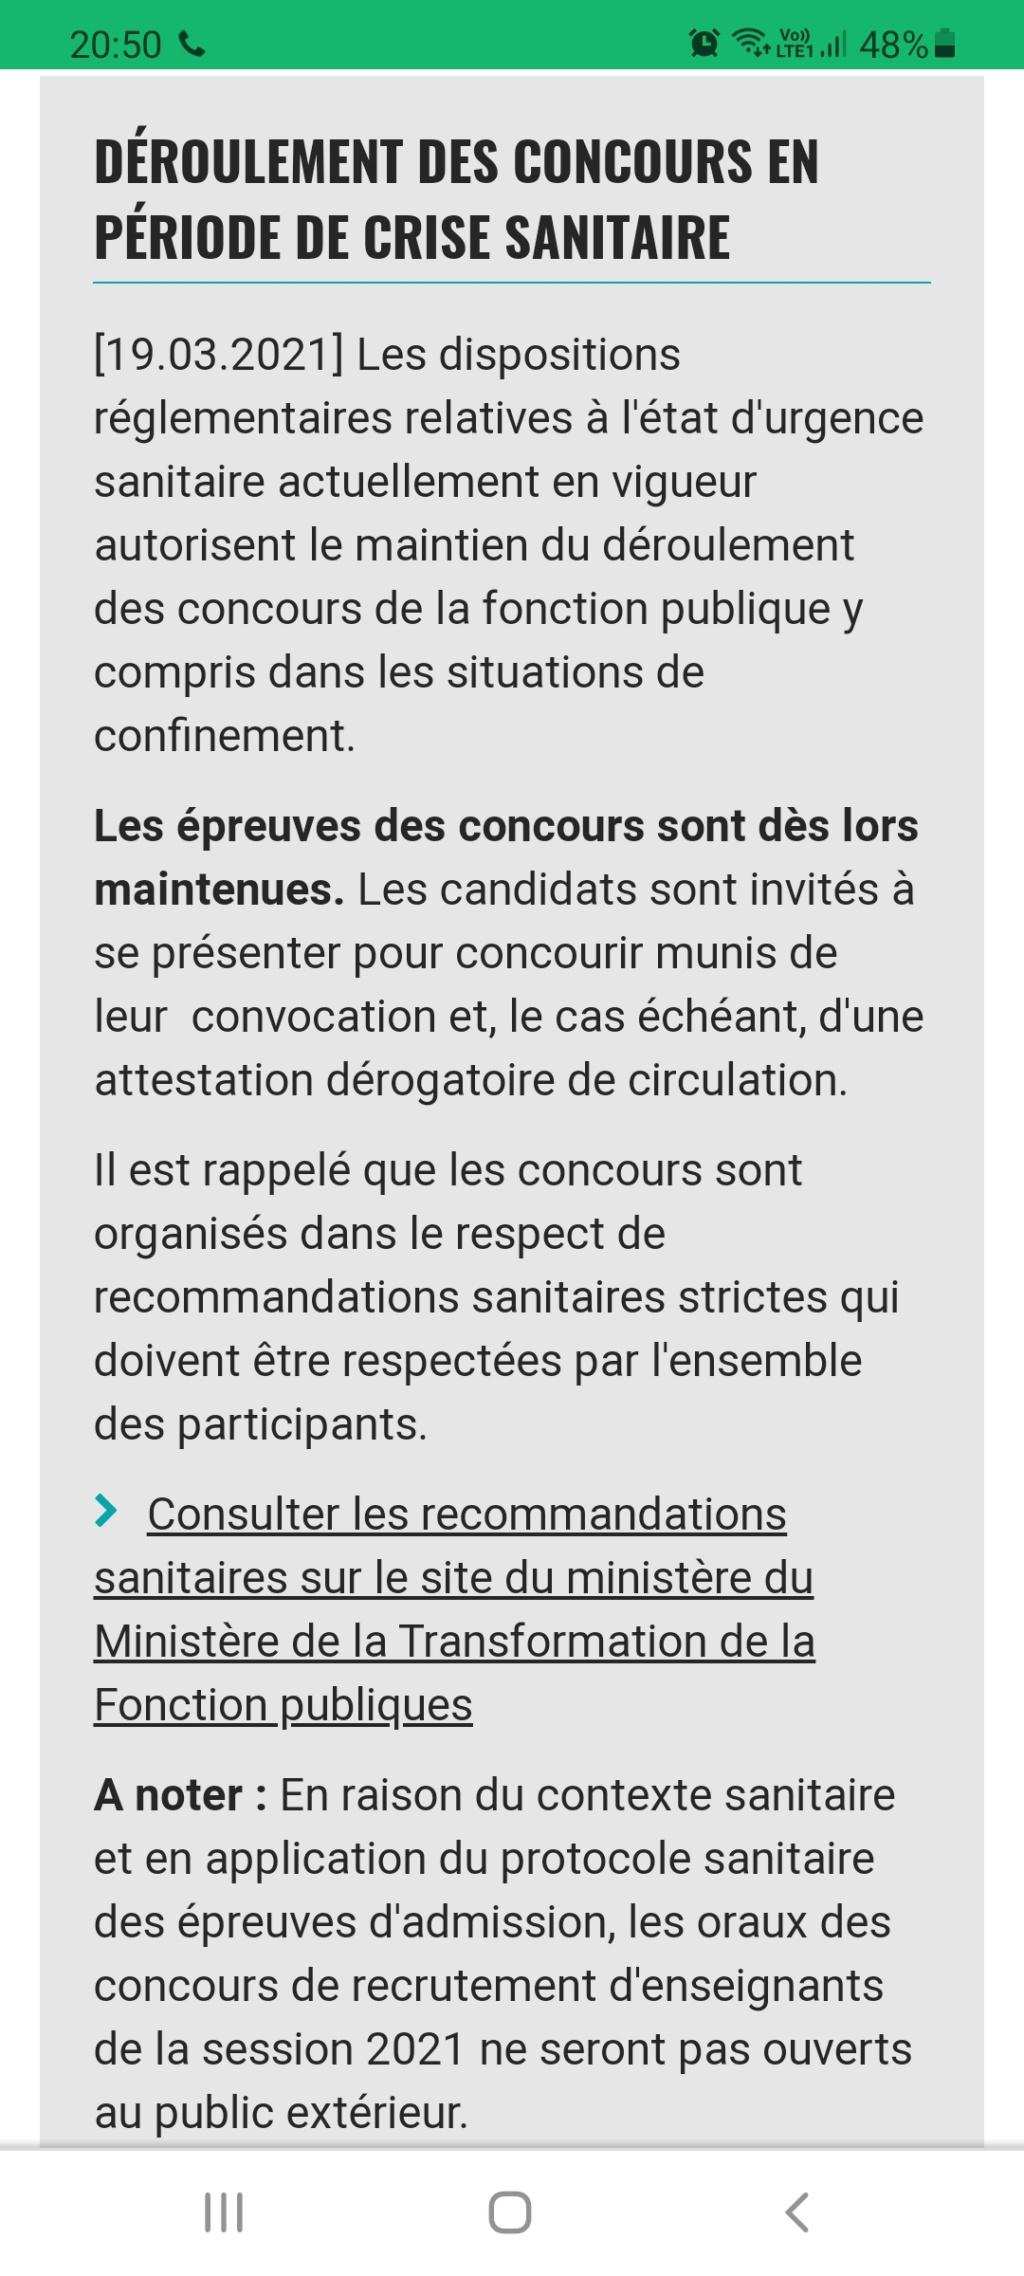 Agrégation interne Lettres Modernes 2021  - Page 2 Screen10